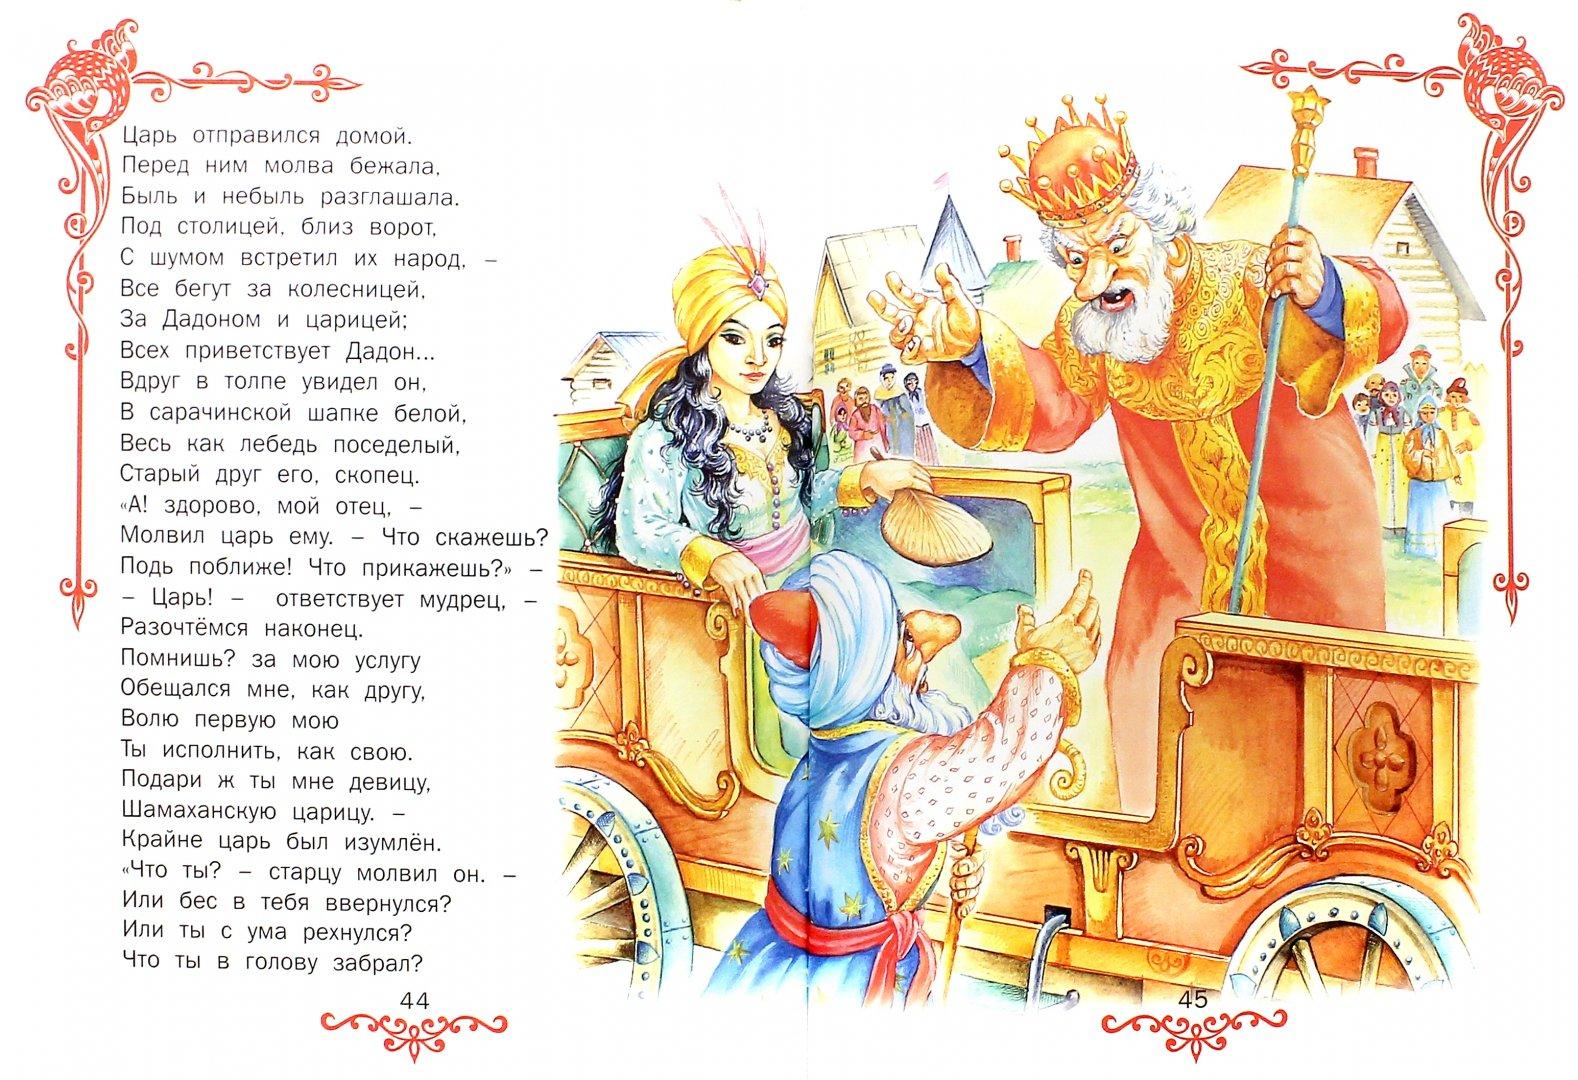 Татьянин, картинки на тему сказок александра сергеевича пушкина